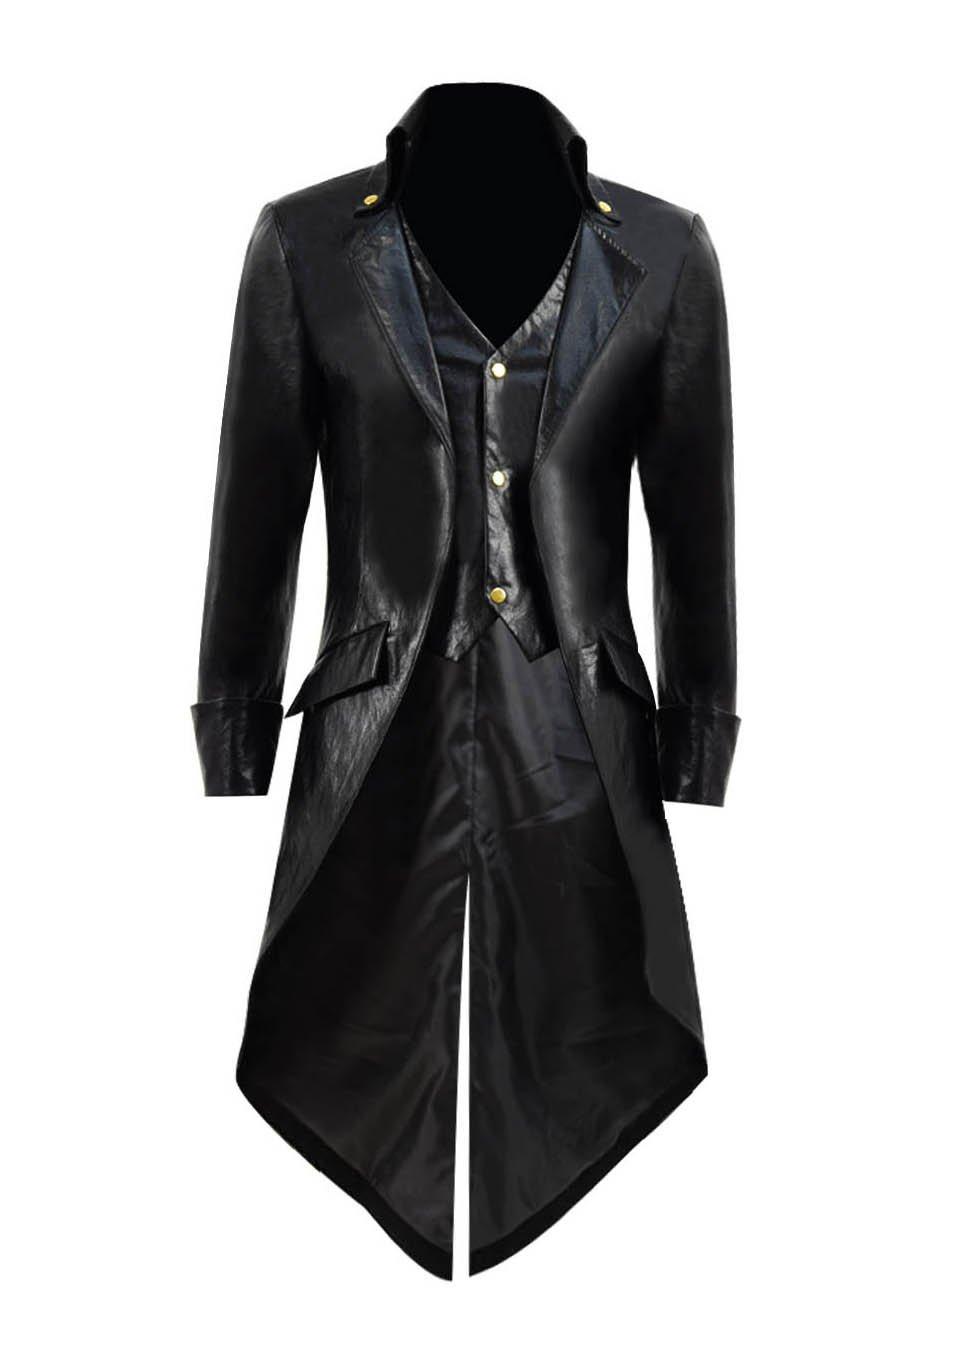 Very Last Shop Mens Gothic Tailcoat Jacket Black Steampunk Victorian Long Coat Halloween Costume (US Men-M, Black A(Faux-Leather))